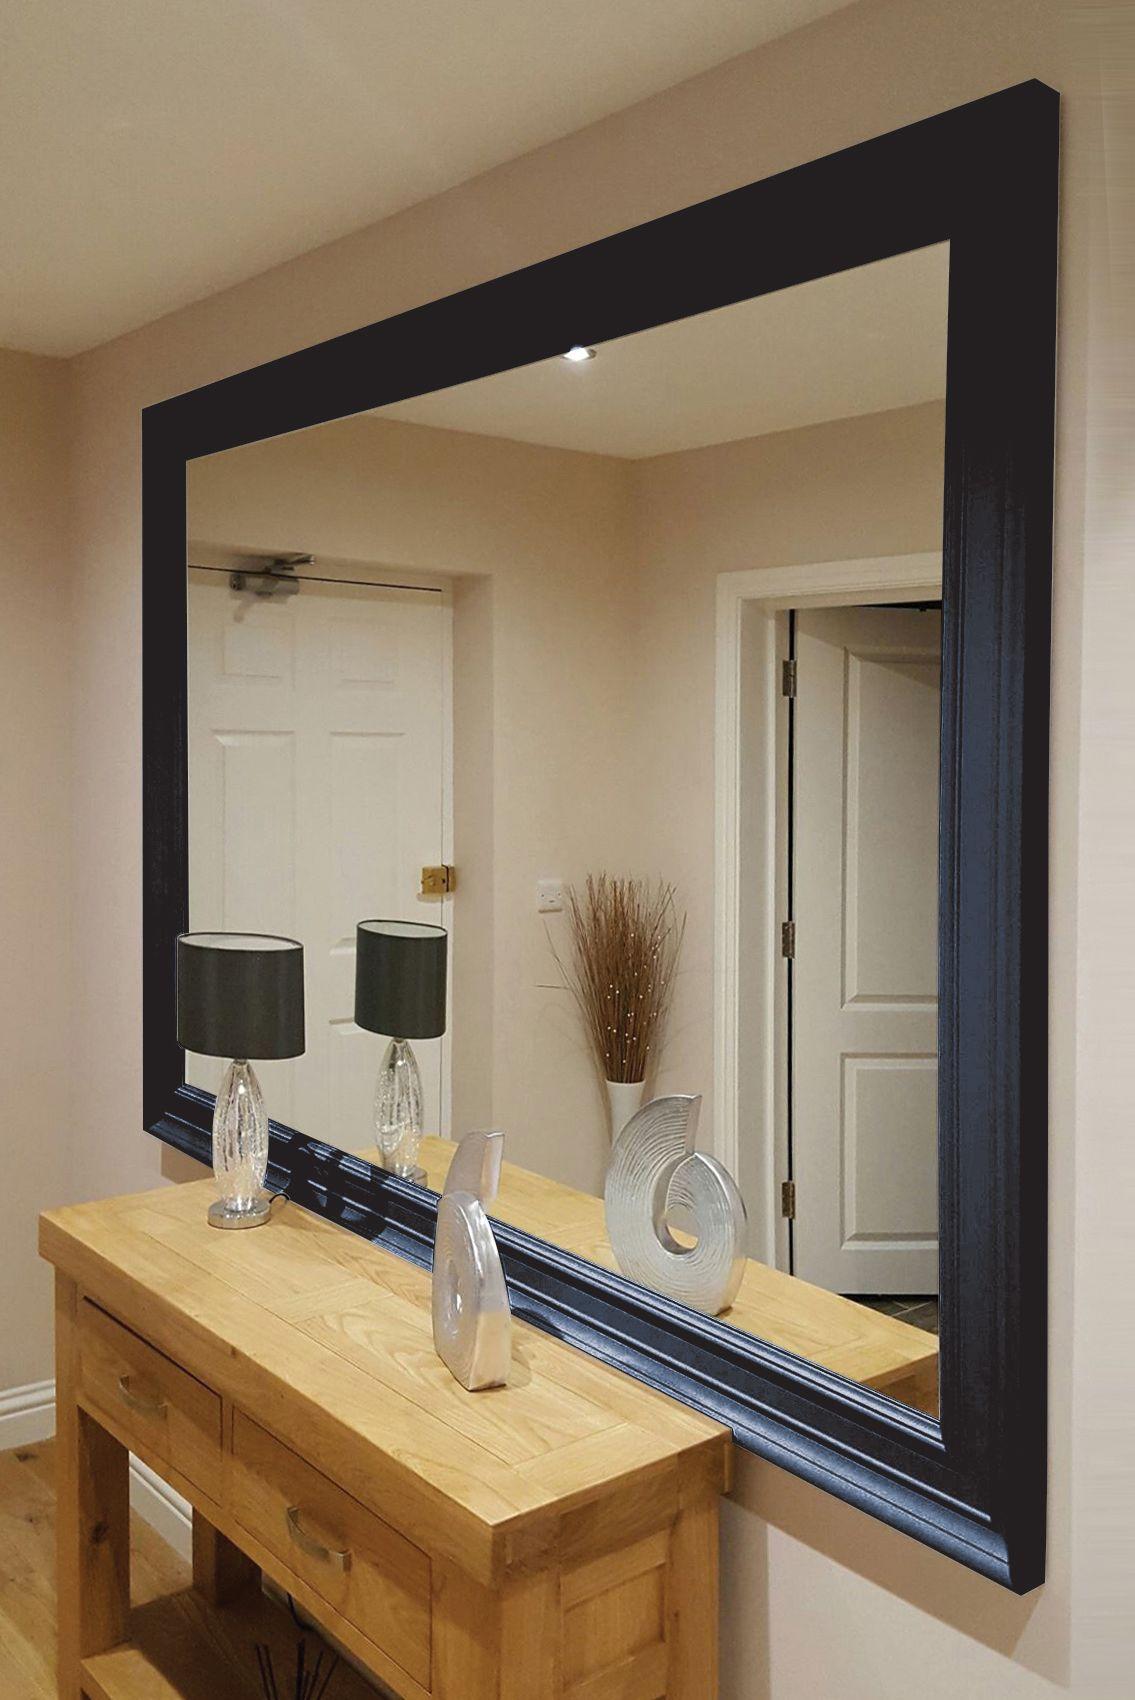 Oxford Extra Large Black Mirror 206x145cm Soraya Inteiors Uk Extra Large Wall Mirrors Large White Mirror Big Wall Mirrors Black and silver mirror